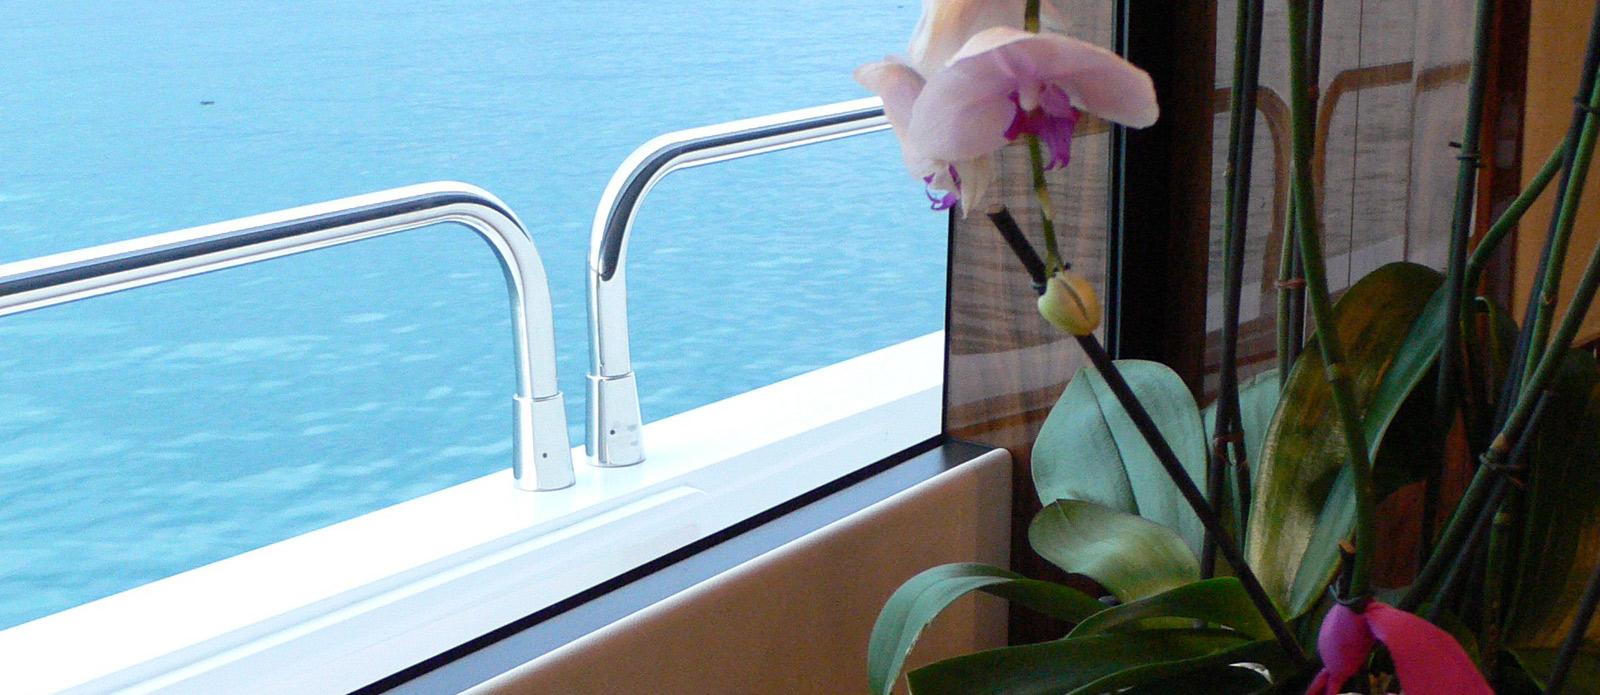 Sunseeker-30-Metre-Yacht-Tuppence-Detail